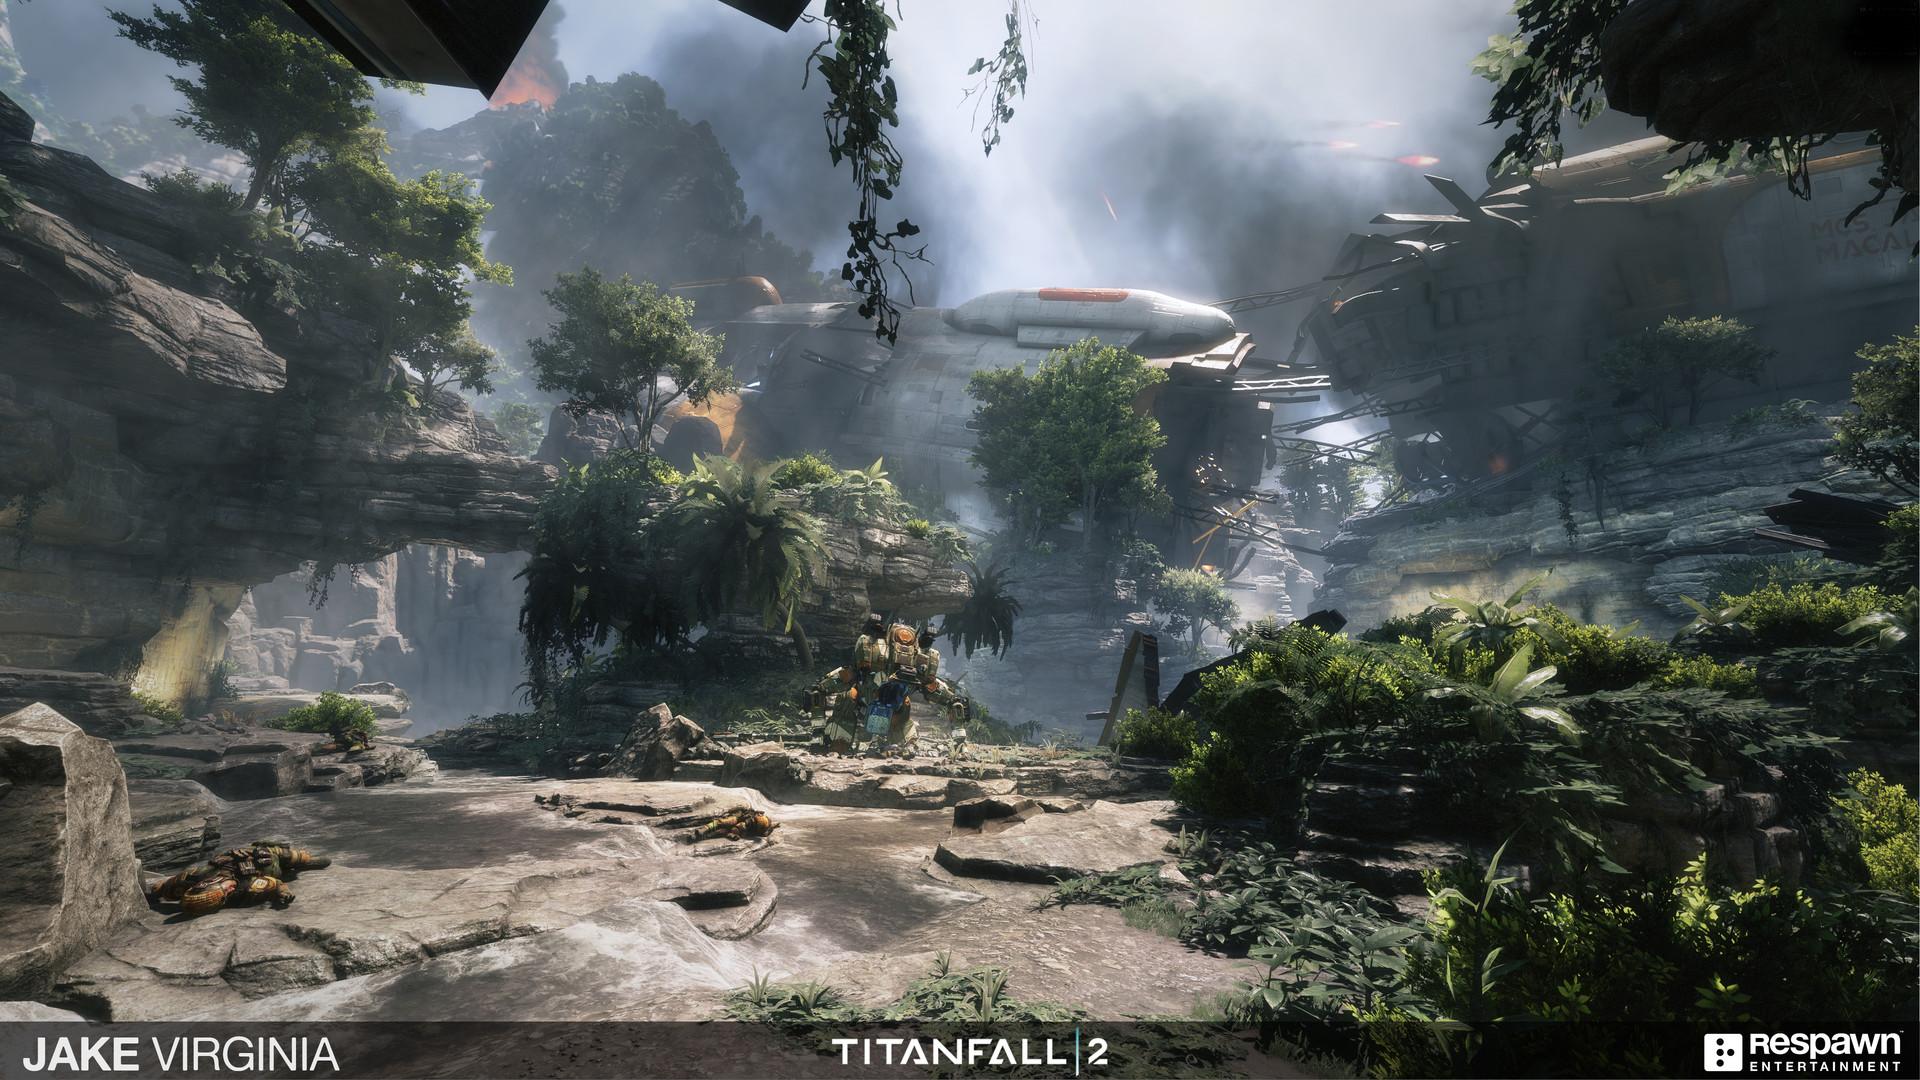 ArtStation - Titanfall 2 - Crashsite, Jake Virginia